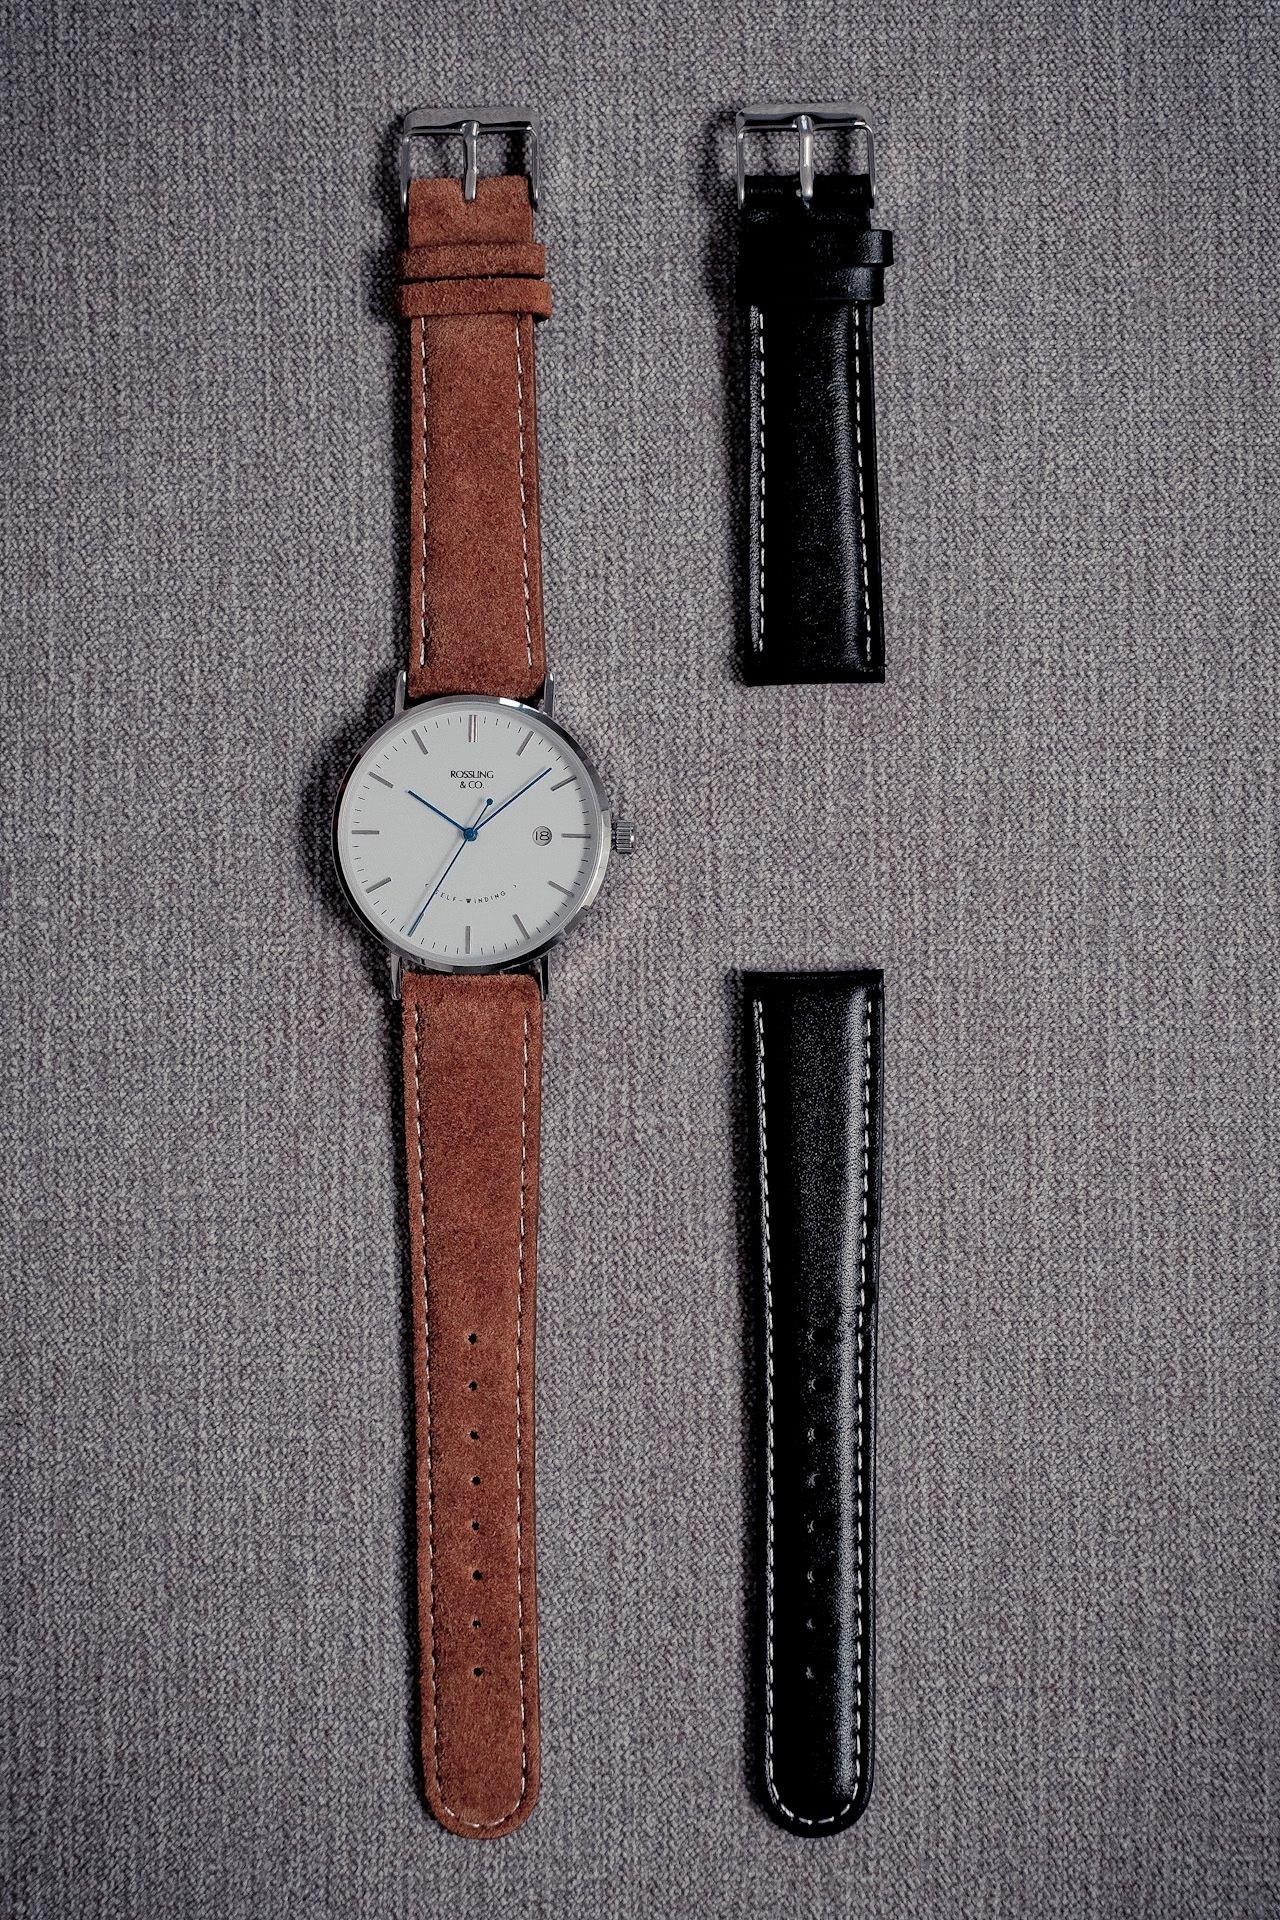 Automatic Wristwatch Strap